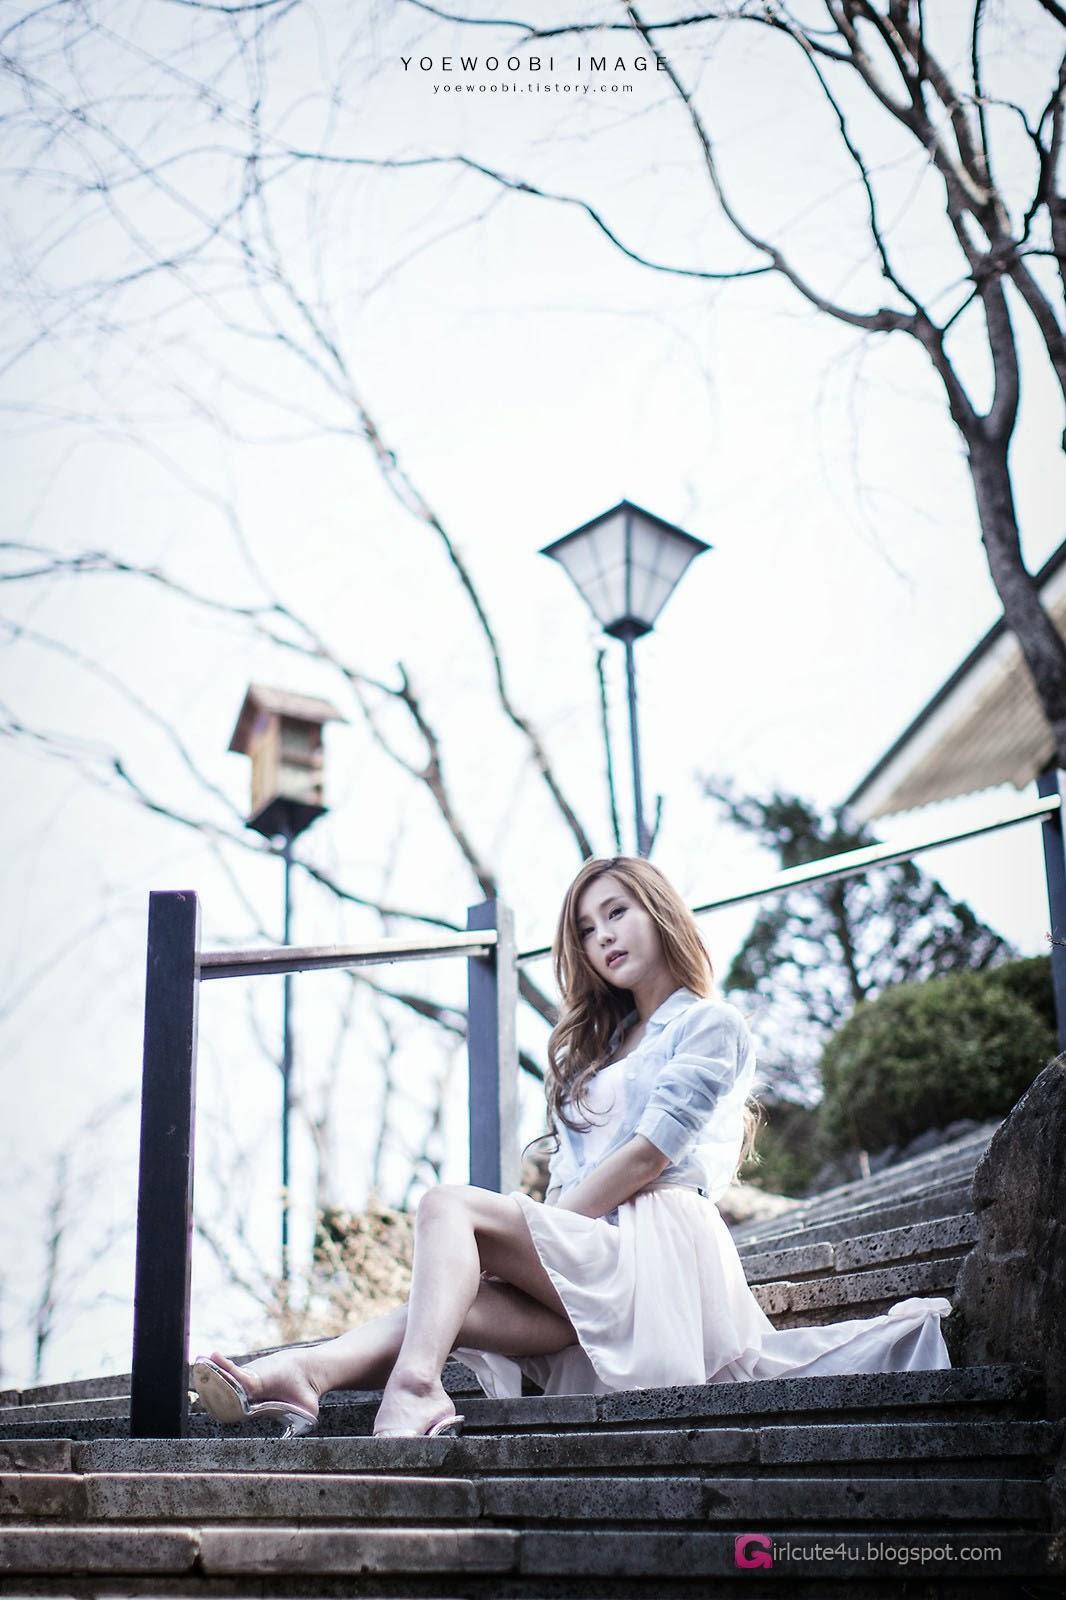 5 Lovely Soo Yu - very cute asian girl-girlcute4u.blogspot.com